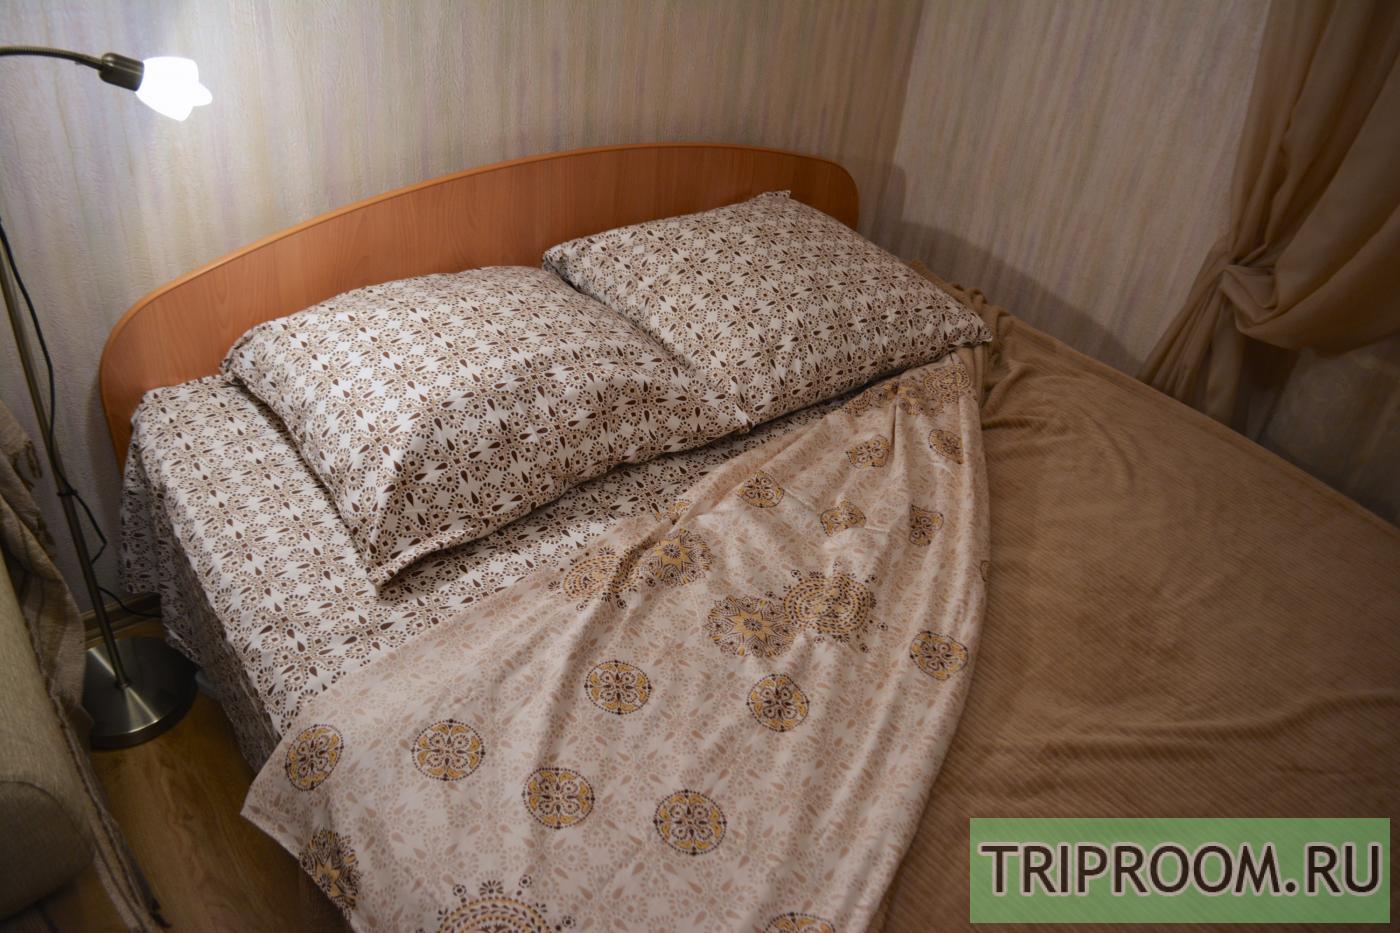 1-комнатная квартира посуточно (вариант № 5487), ул. Кропоткина улица, фото № 1